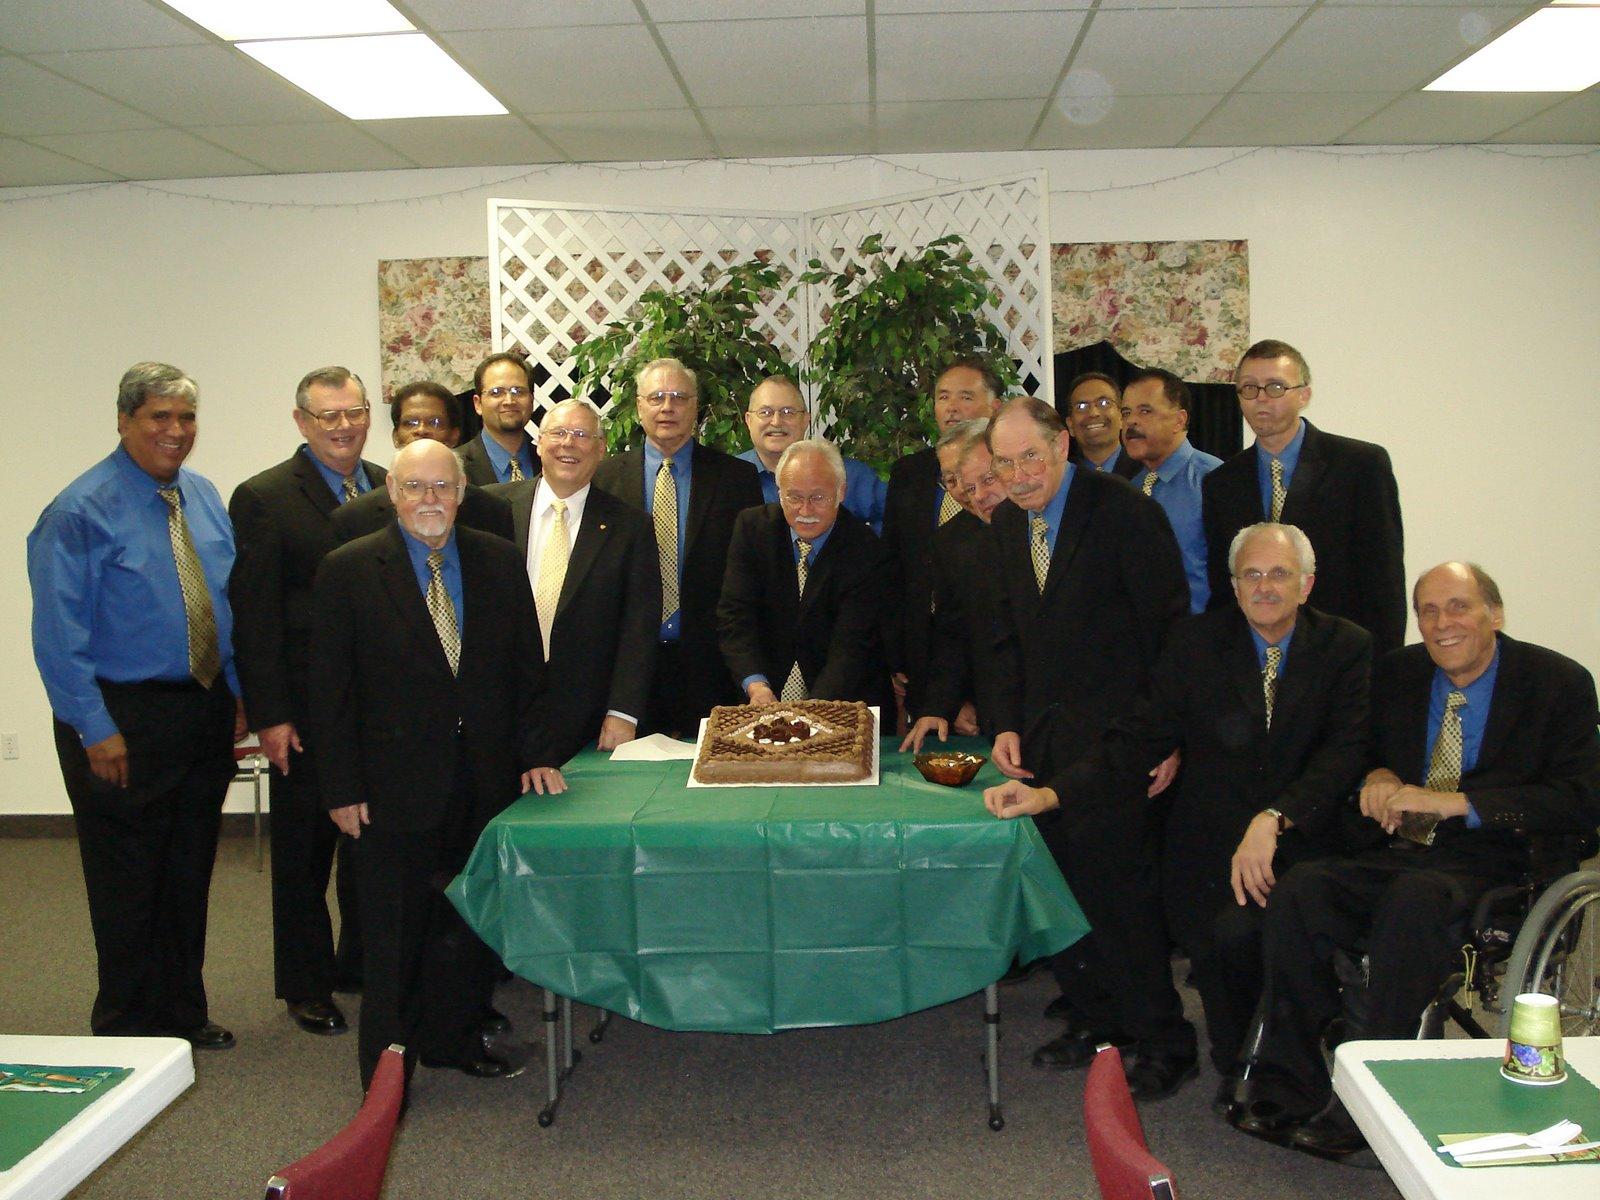 [HV+Group+Cake+Photo+at+Arden+Hills.jpg]